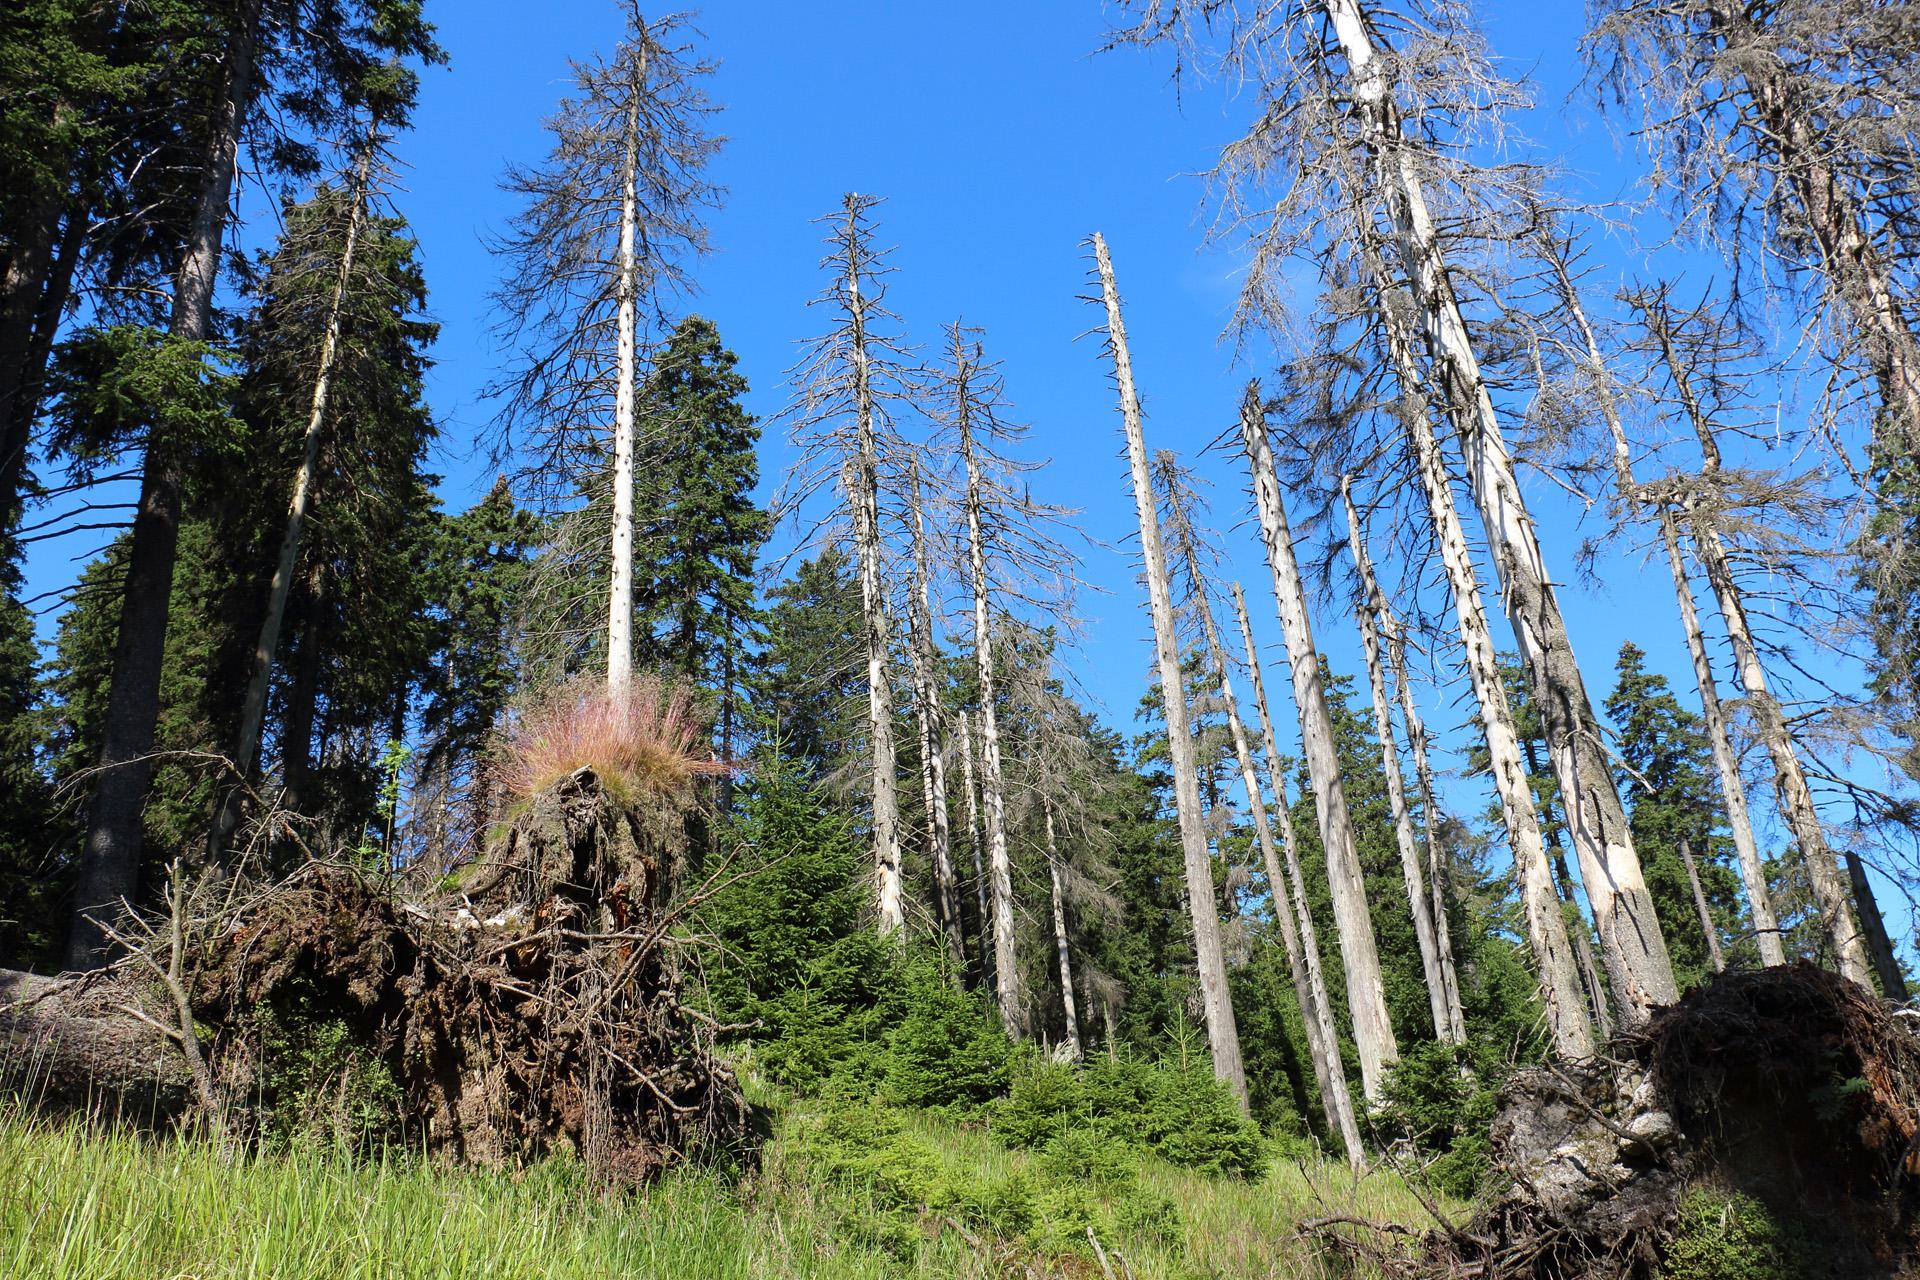 Waldforschungsflaeche-Brockenosthang-3-Reitgras-Fichtenwald_Springemann